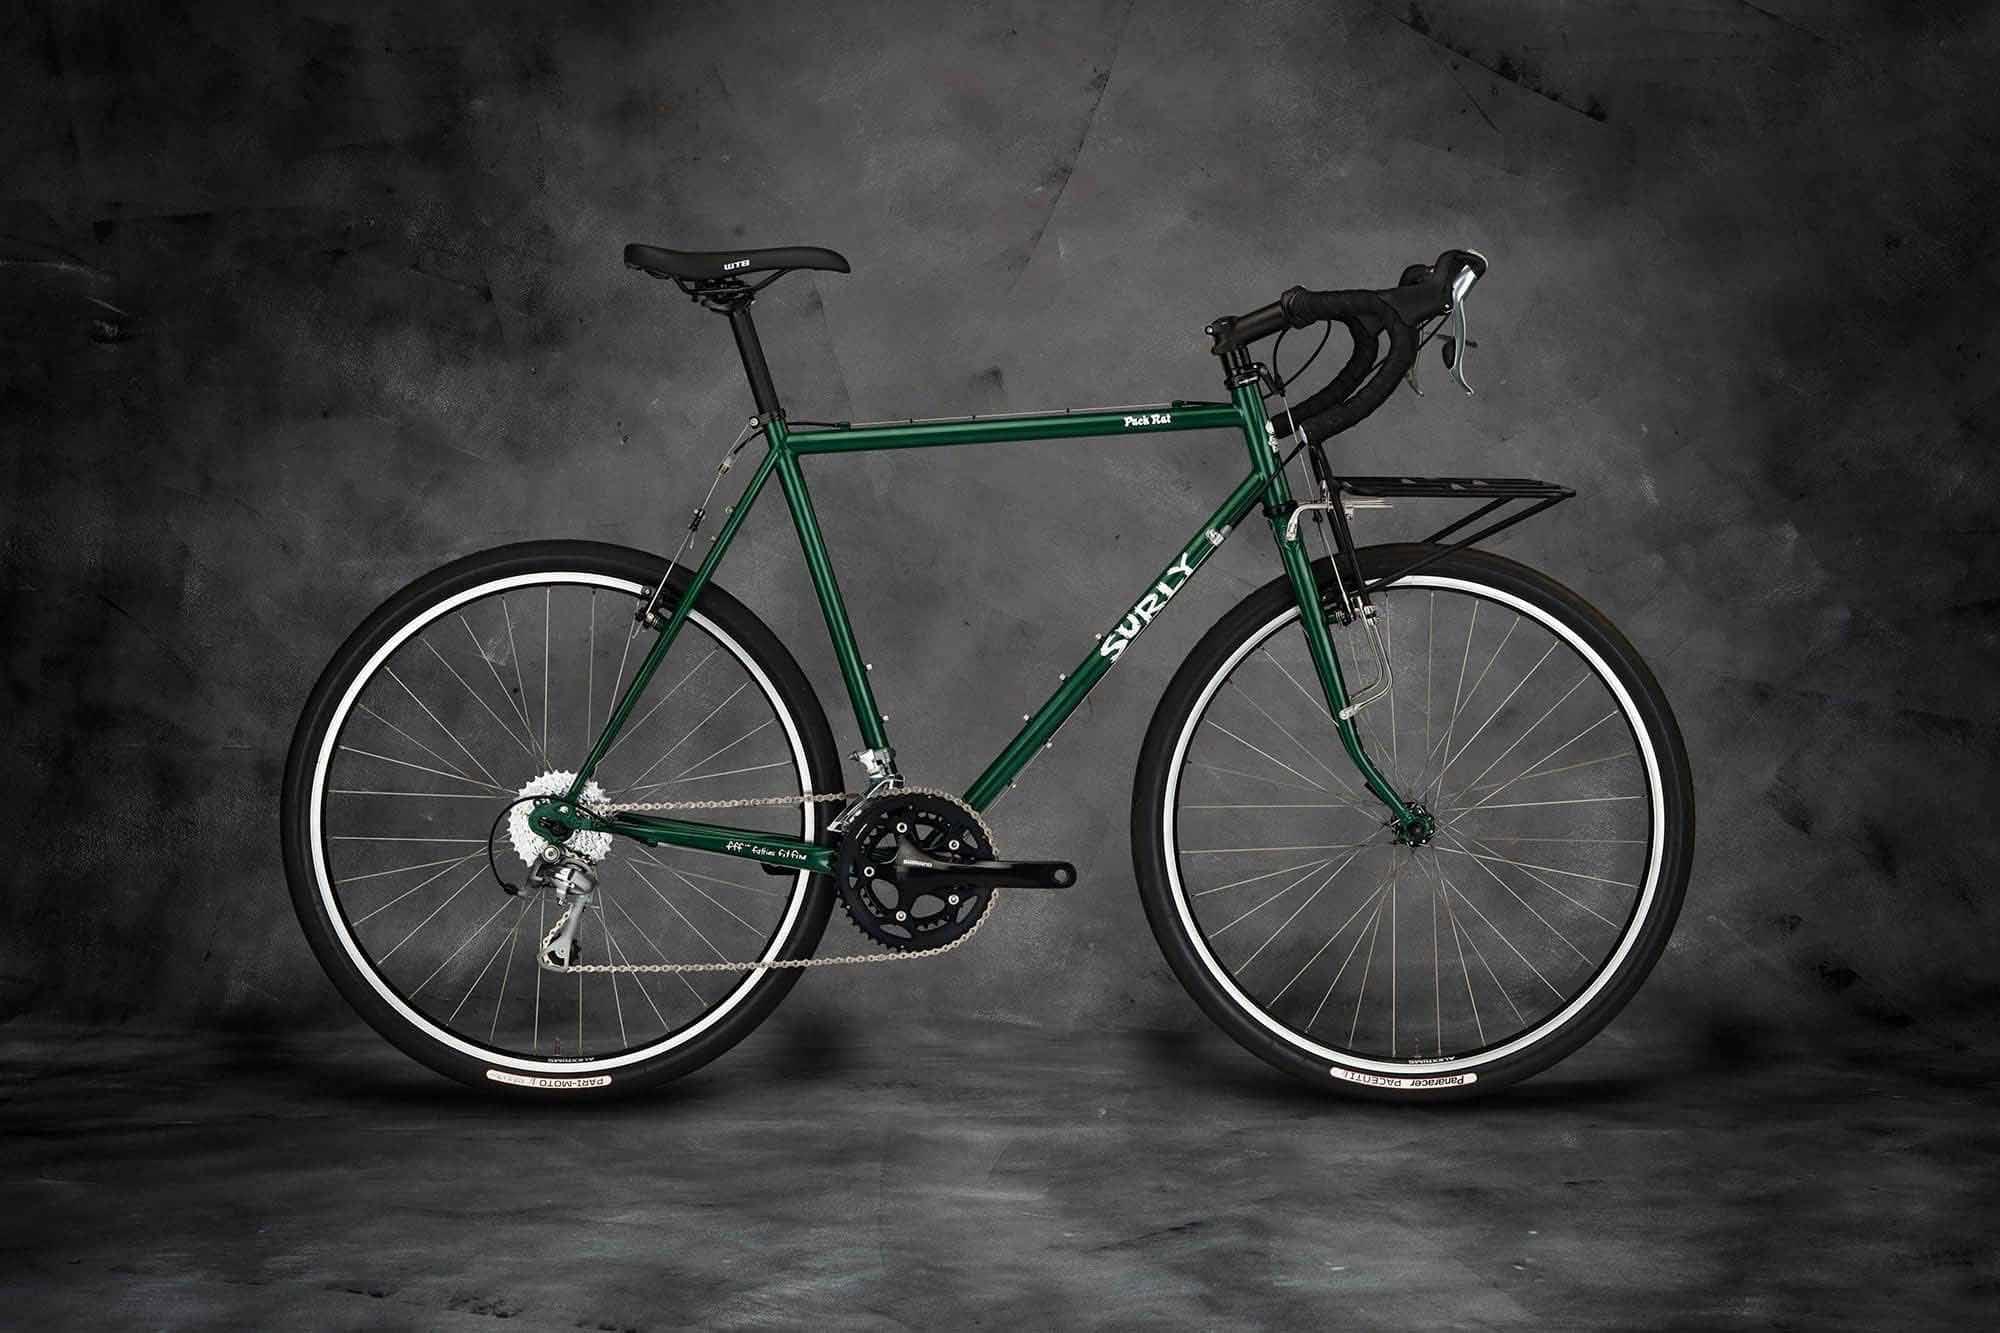 Surly Pack Rat Bike 650b - Get In Green